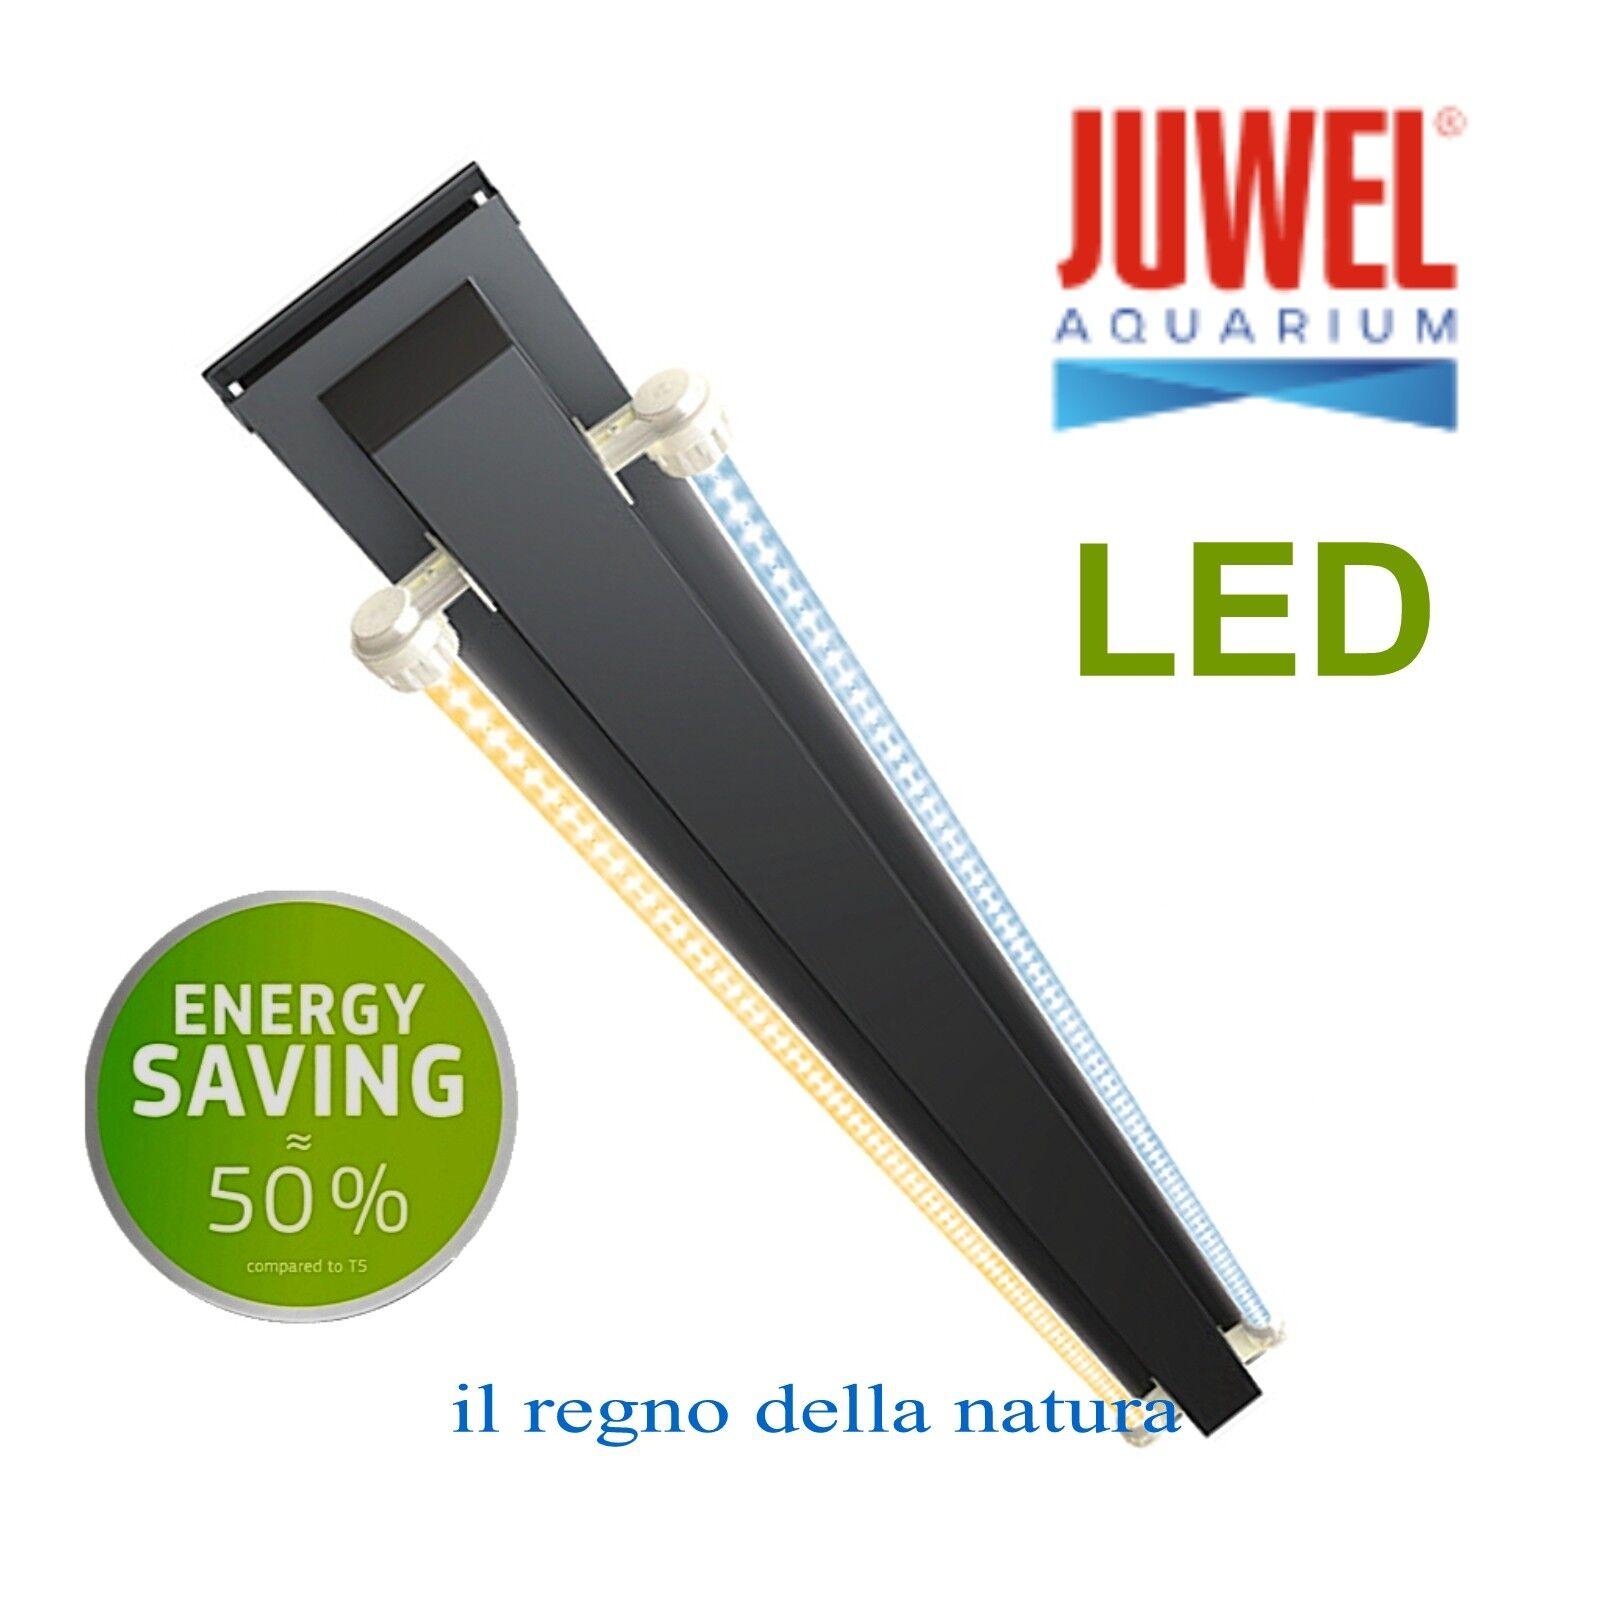 JUWEL MULTILUX LED GRUPPO LUCE ILLUMINAZIONE 2x29W 120cm PER ACQUARI JUWEL